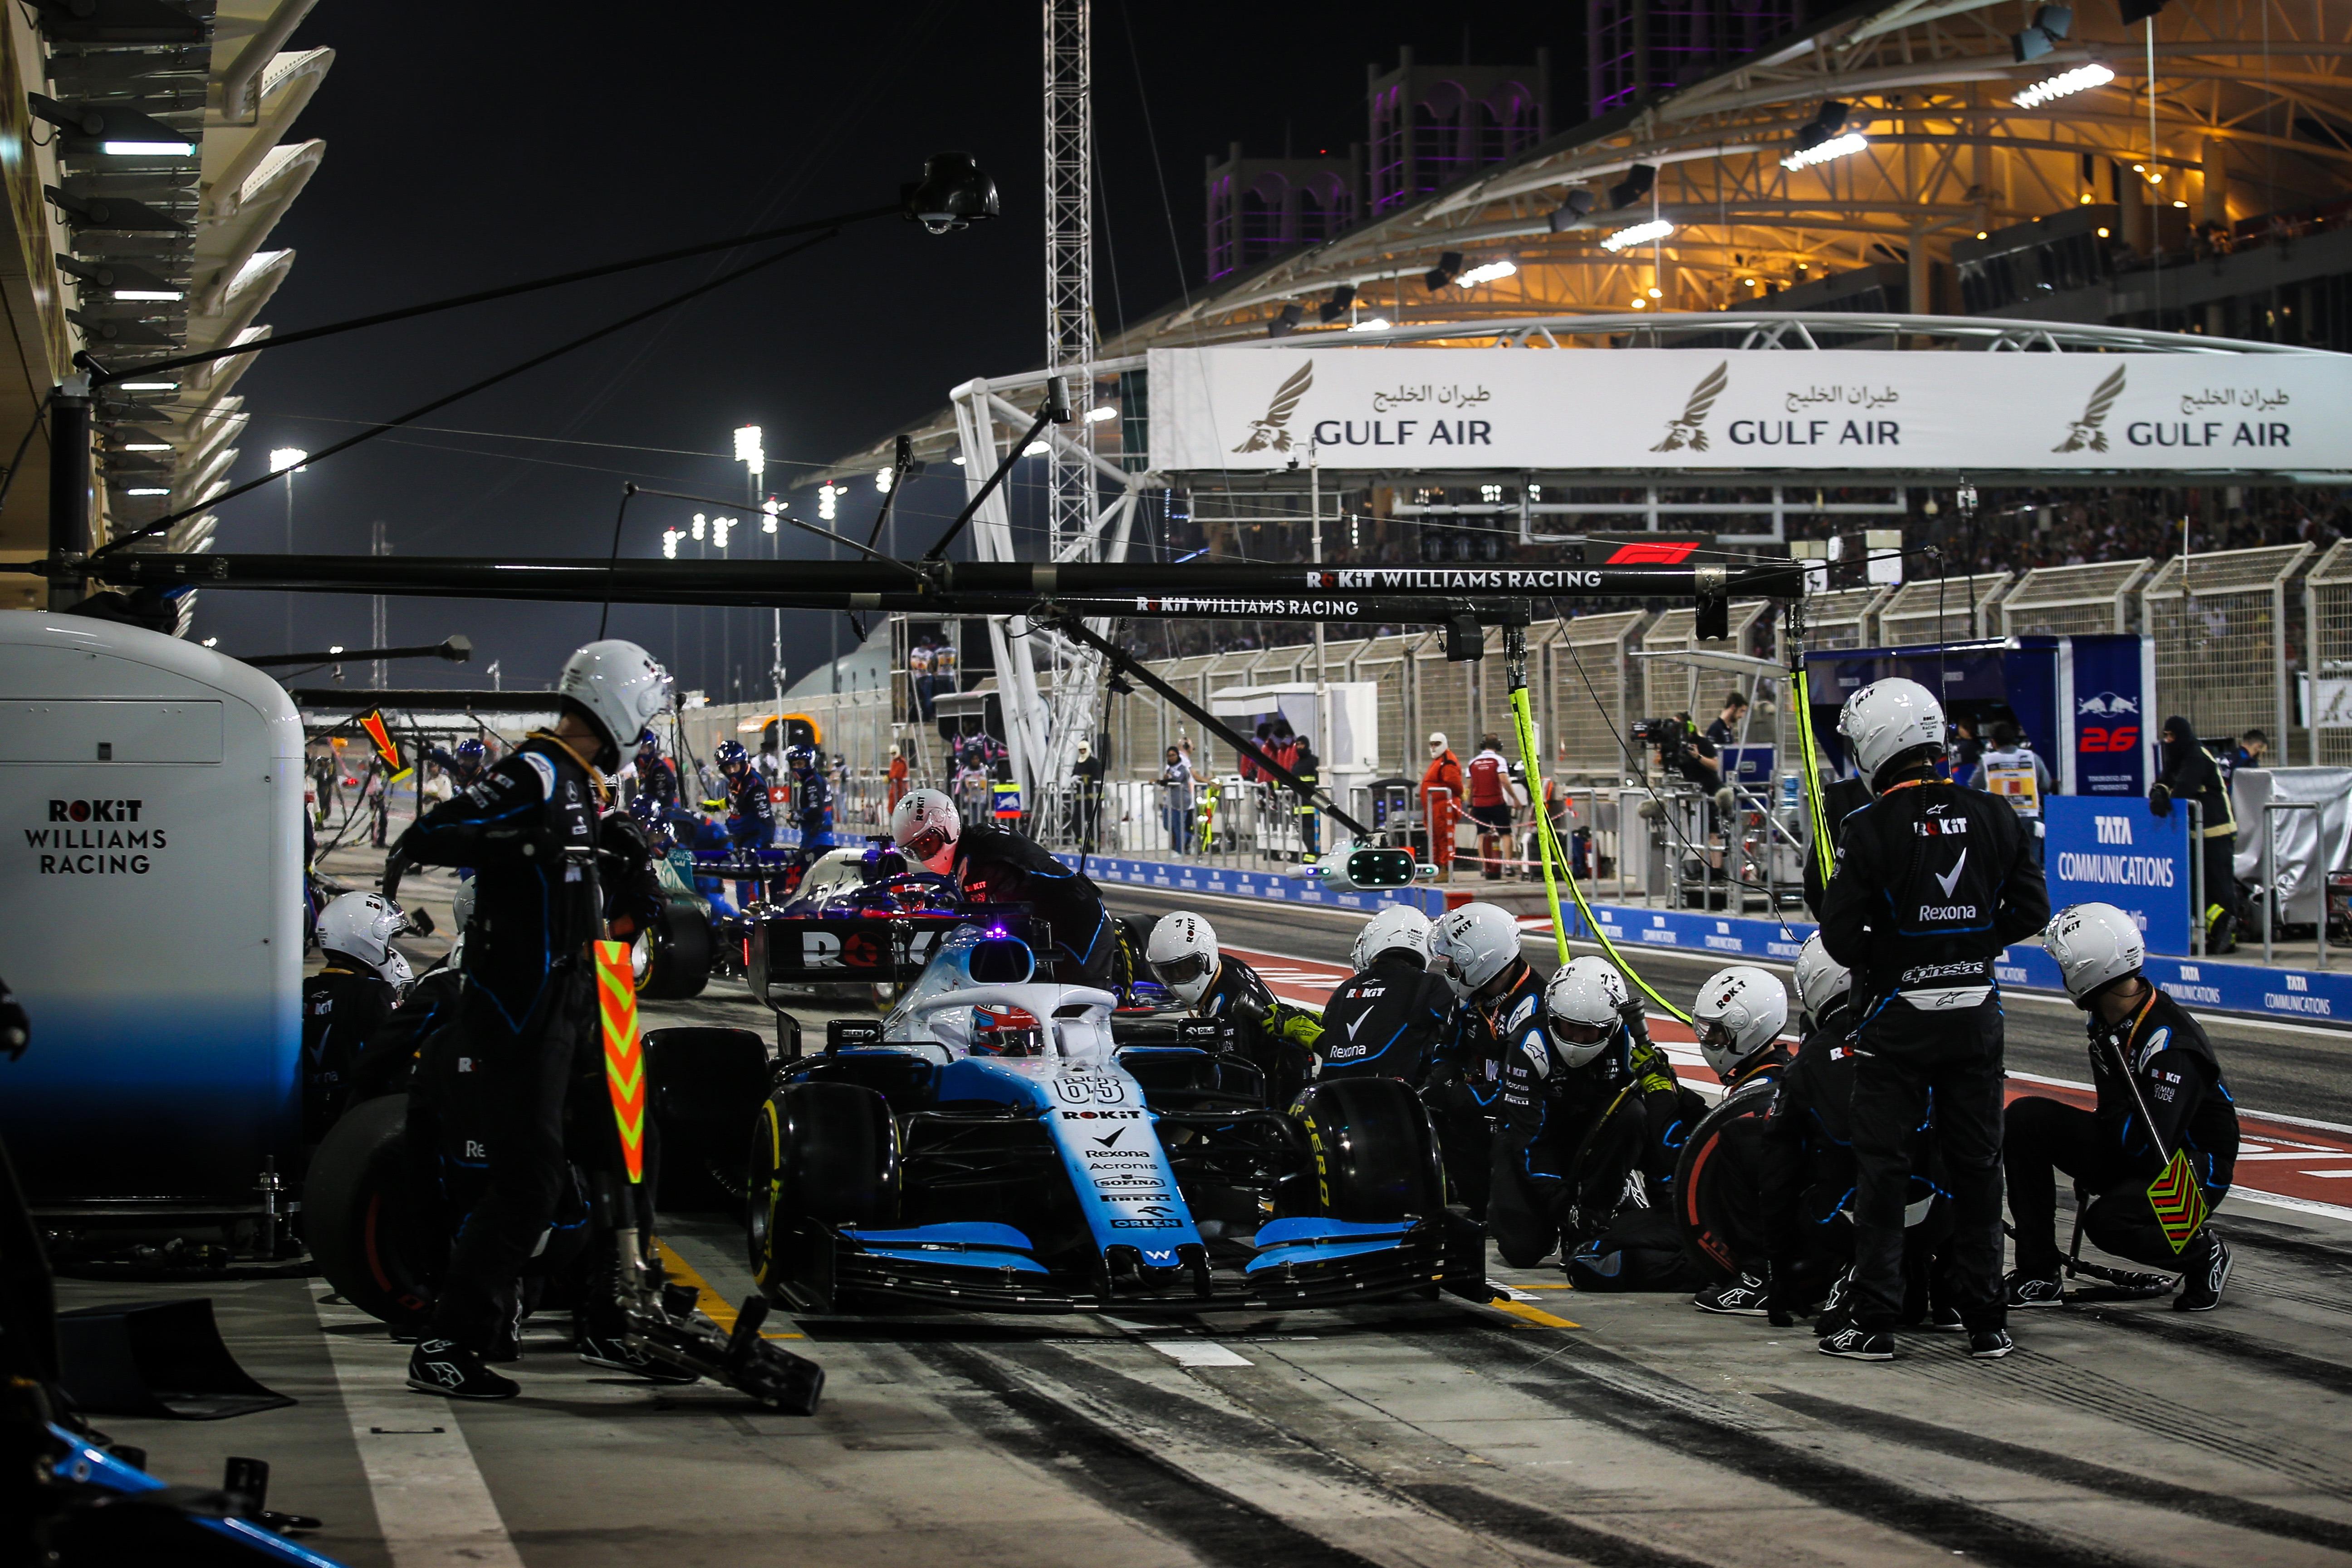 Ecclestone: Williams situation 'terrible'